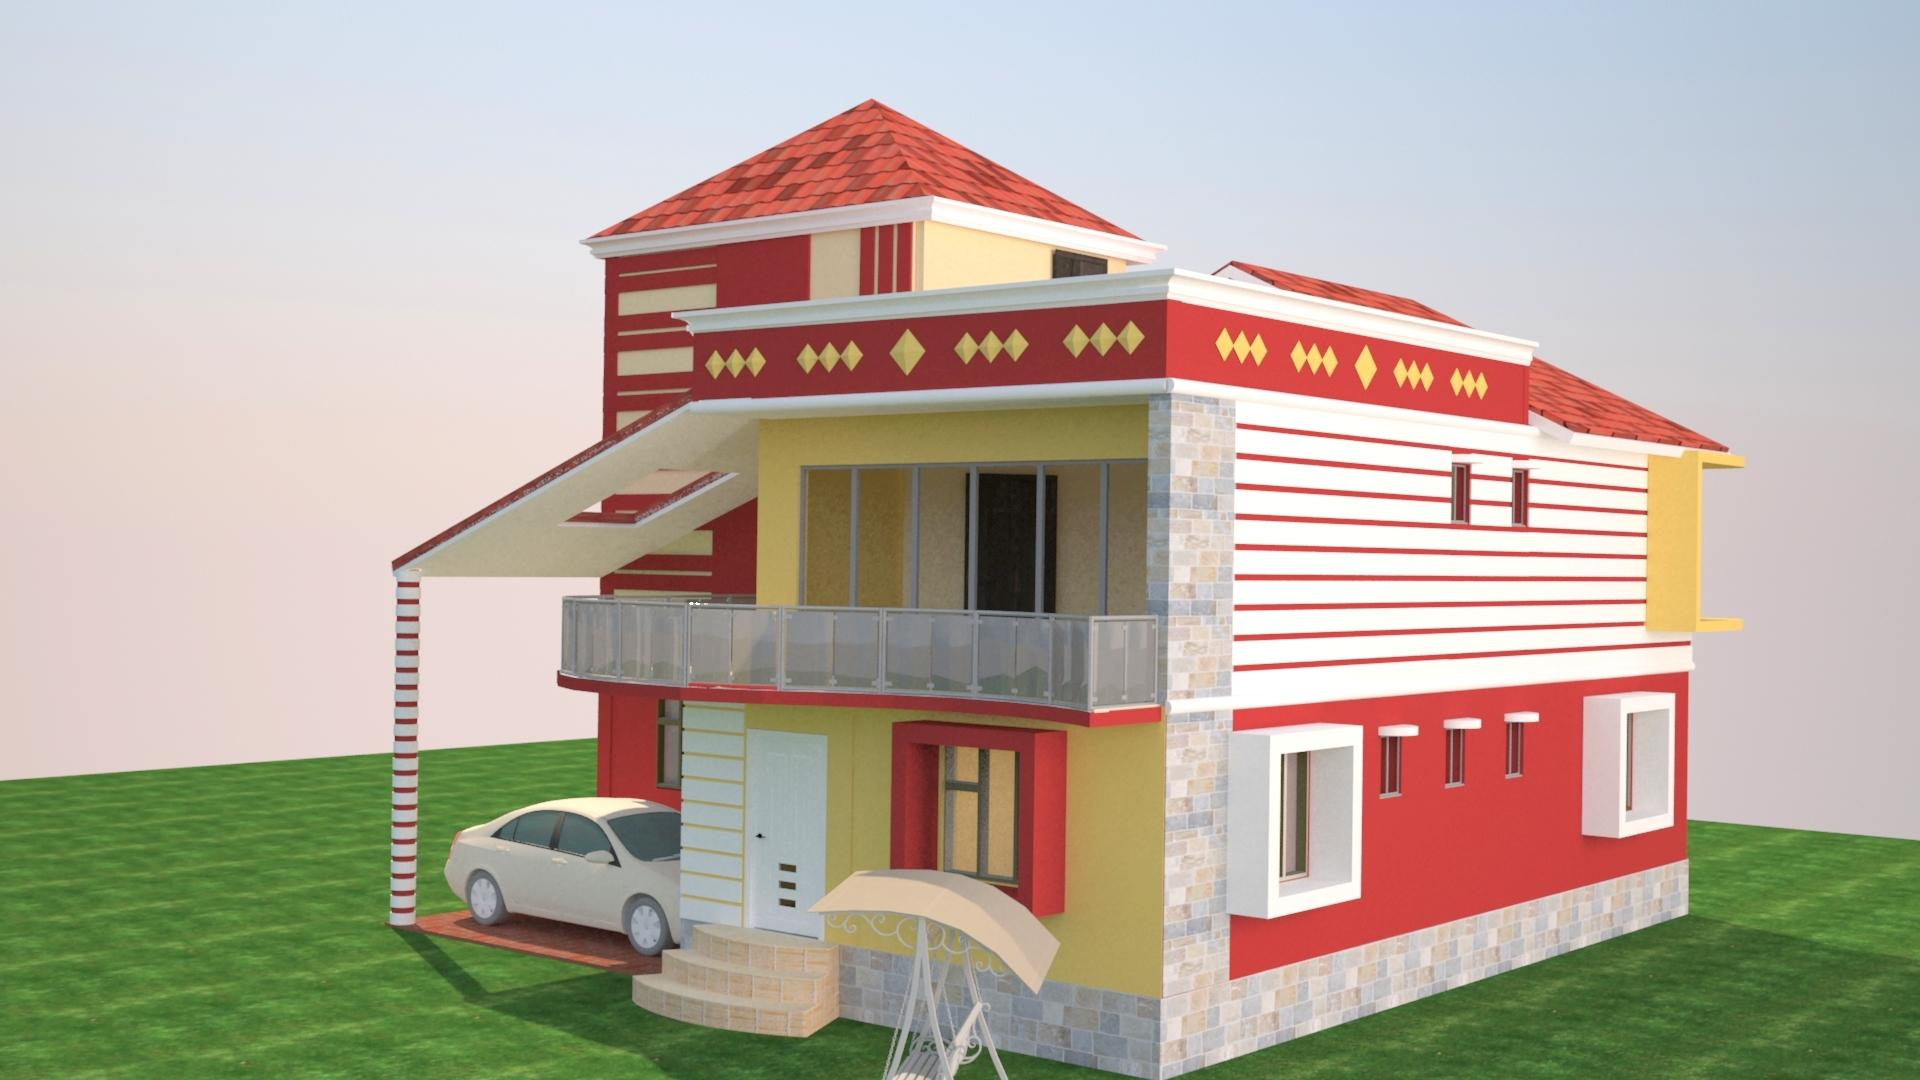 2 storey house elevation rende....